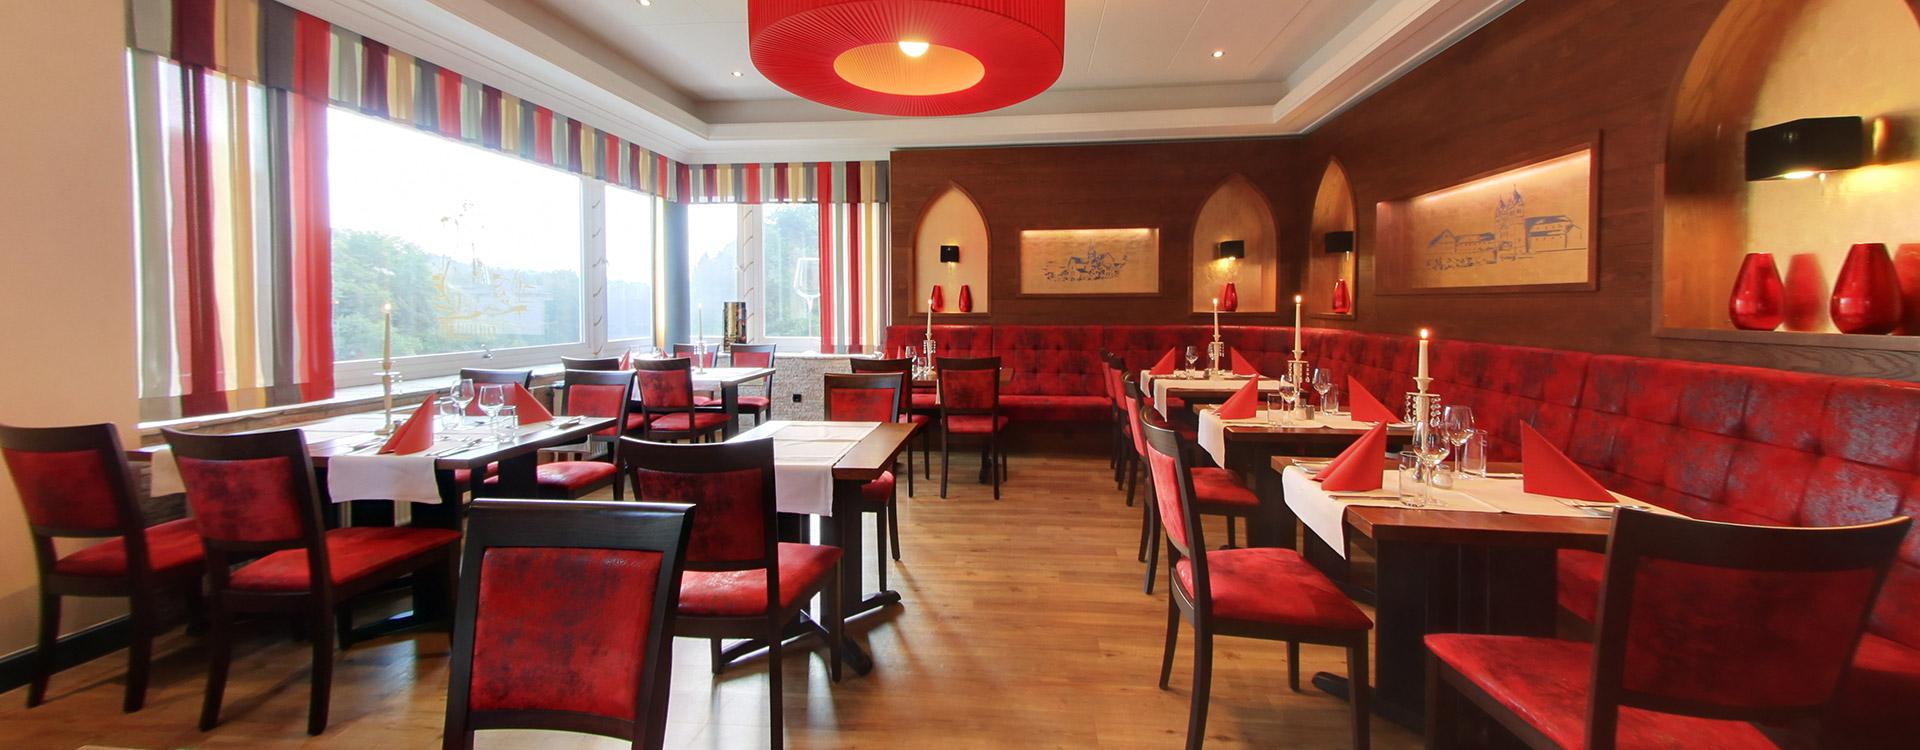 akzent_waldhotel_rheingau_geisenheim_restaurant_02